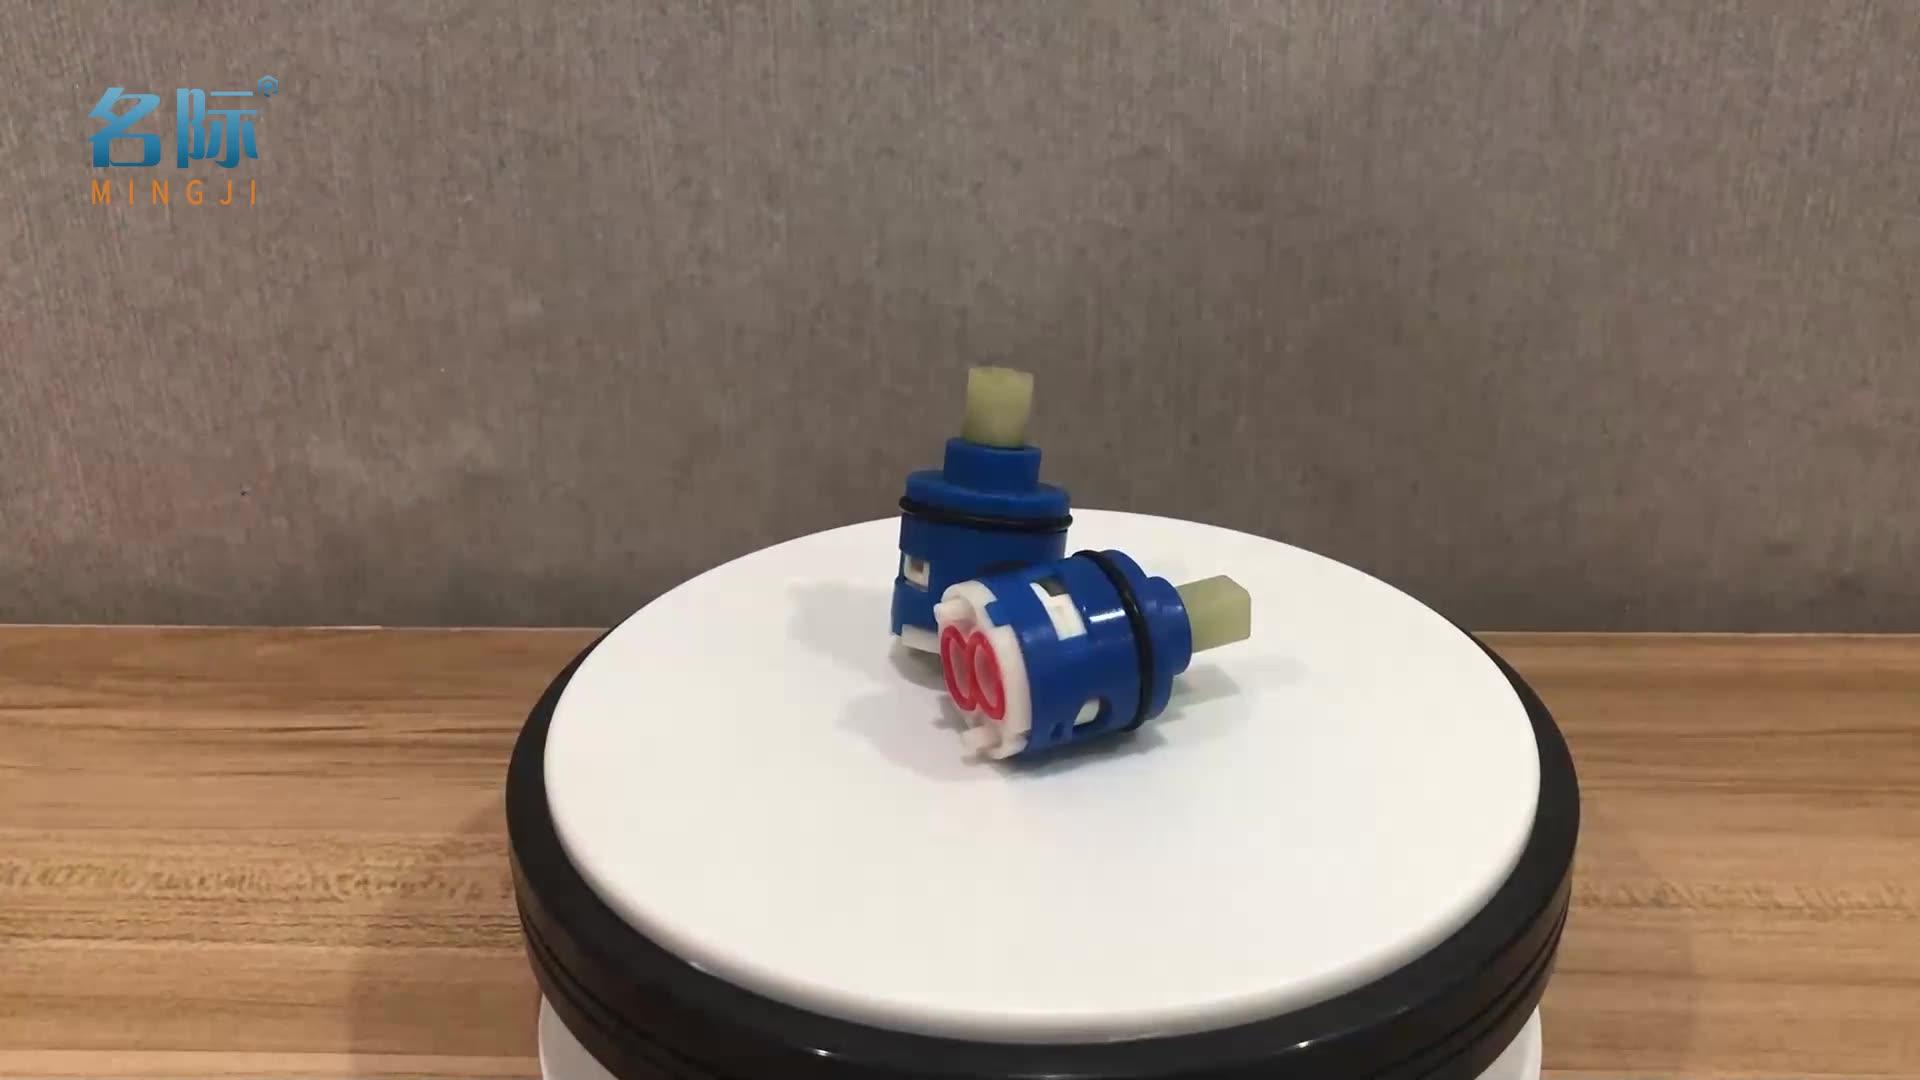 MINGJI 25mm 2Way Diverter Faucet Ceramic Cartridge with Plastic Lever